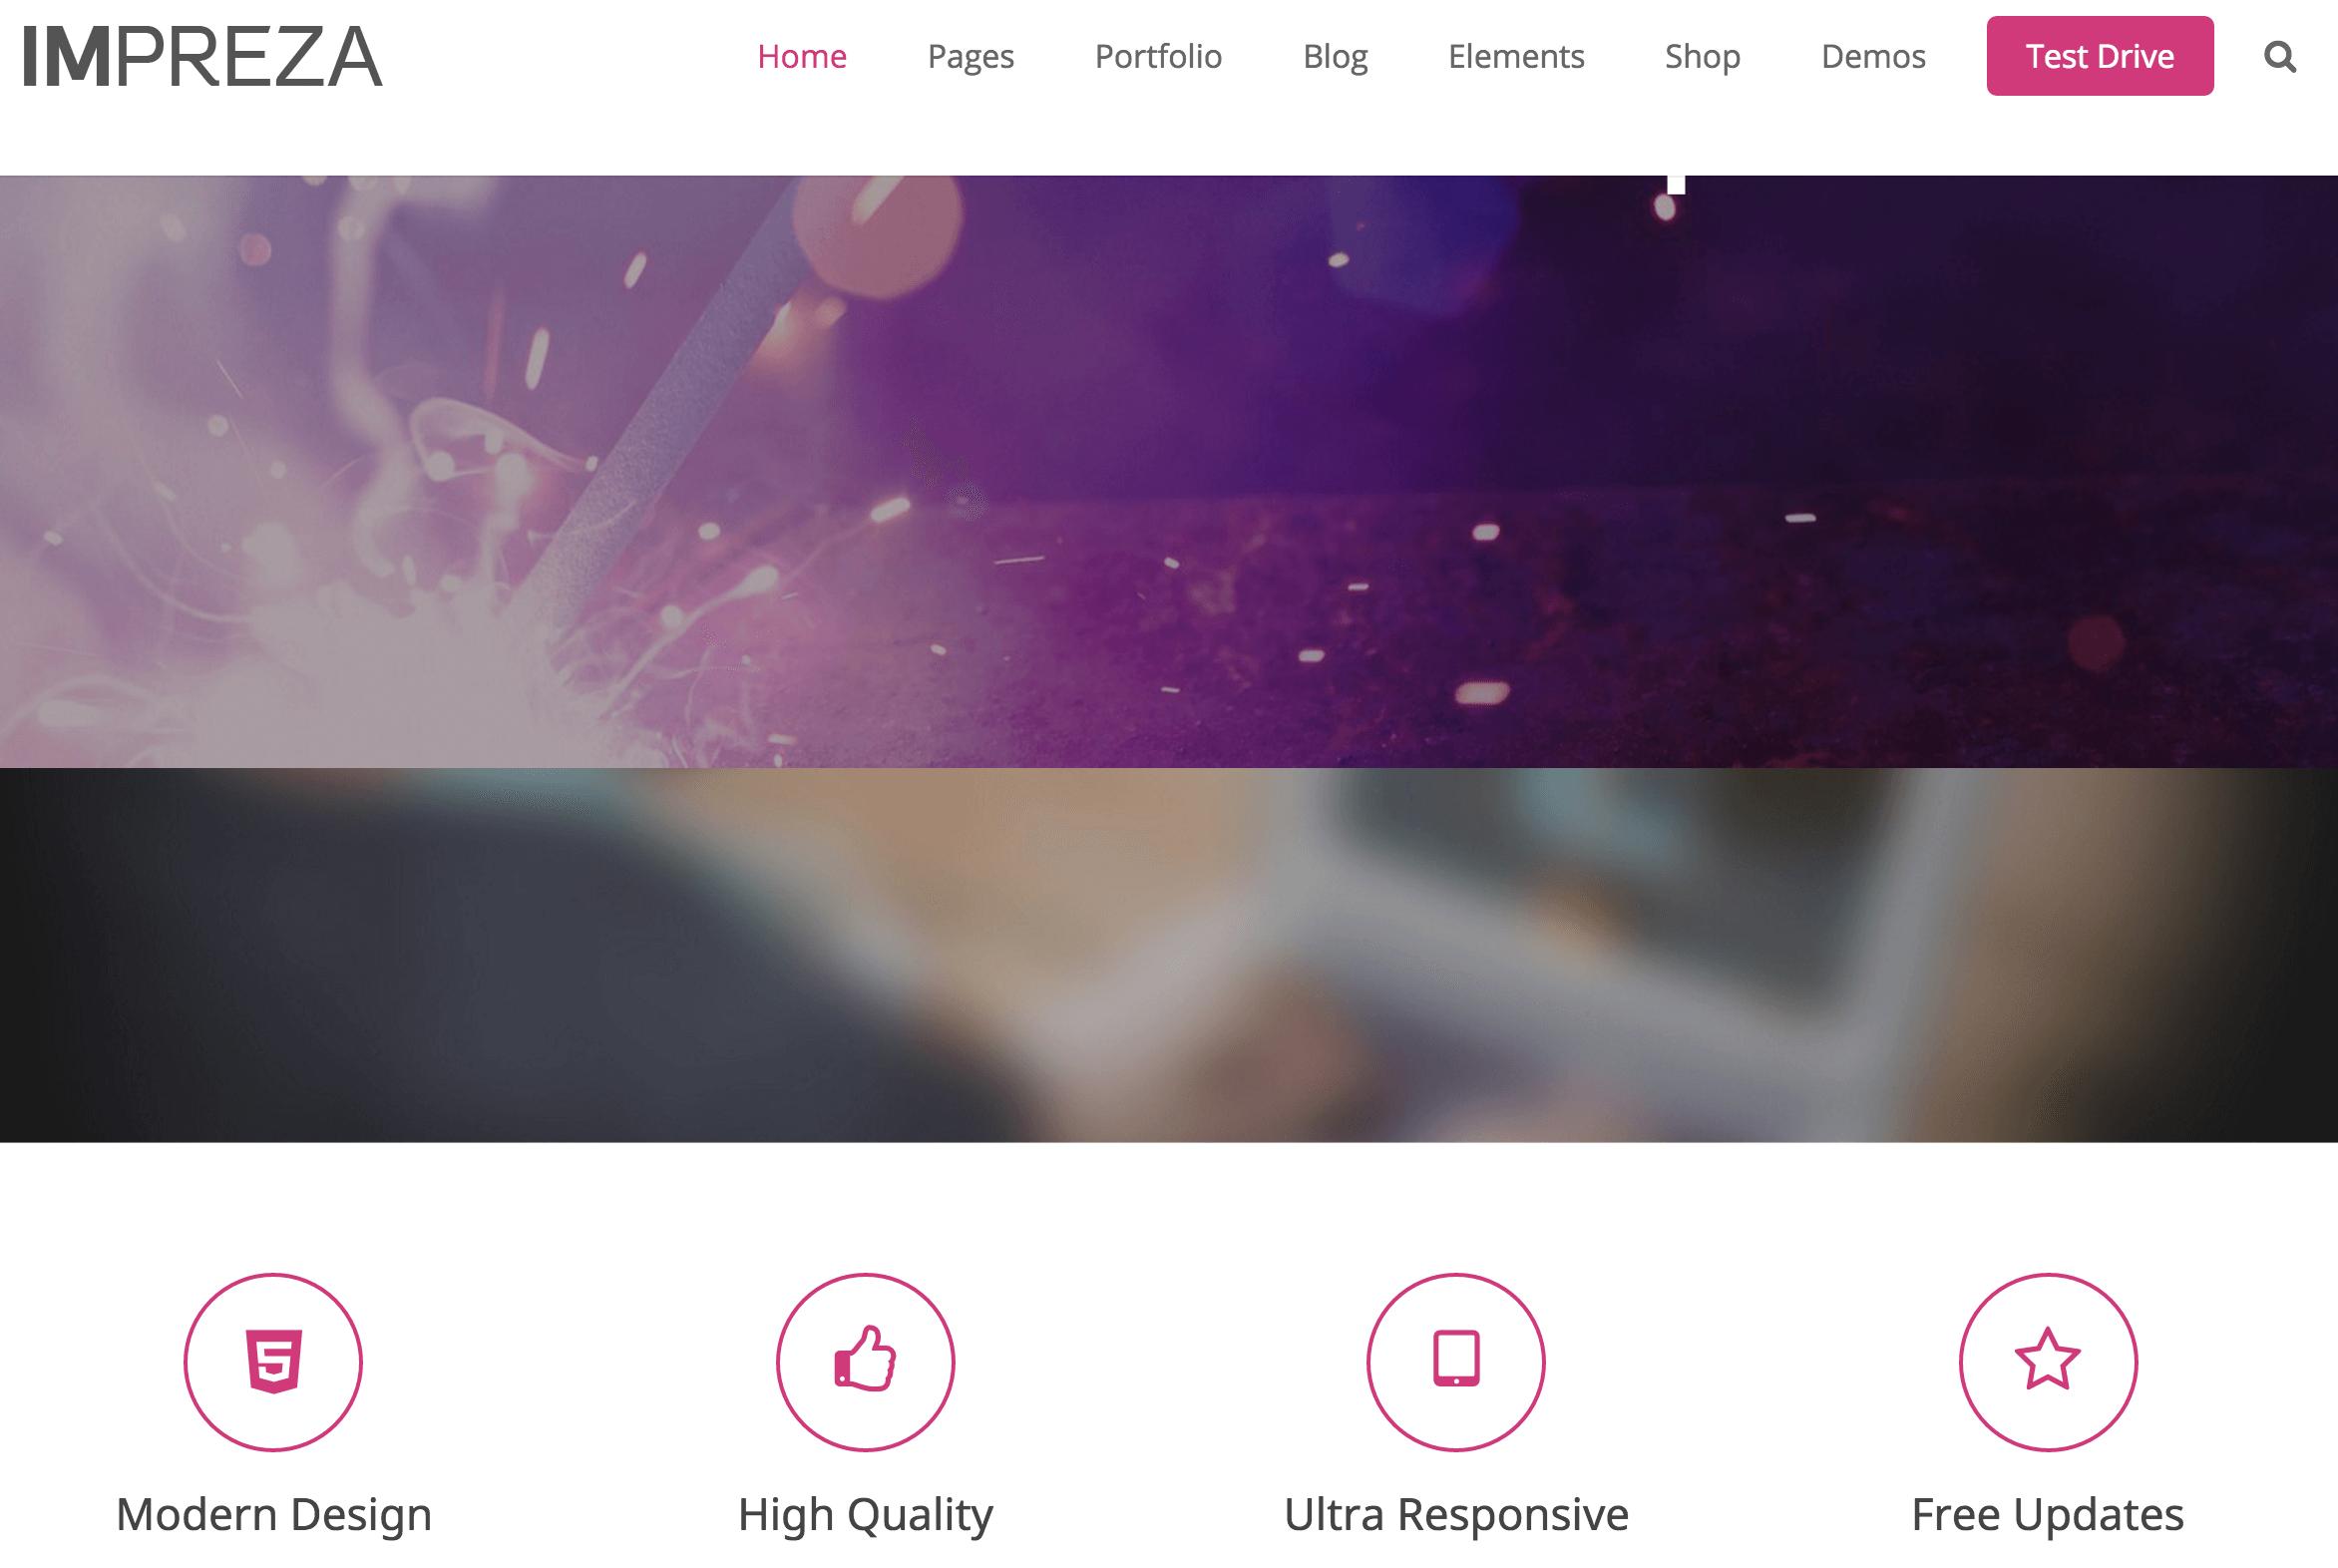 A screenshot of the Impreza theme.